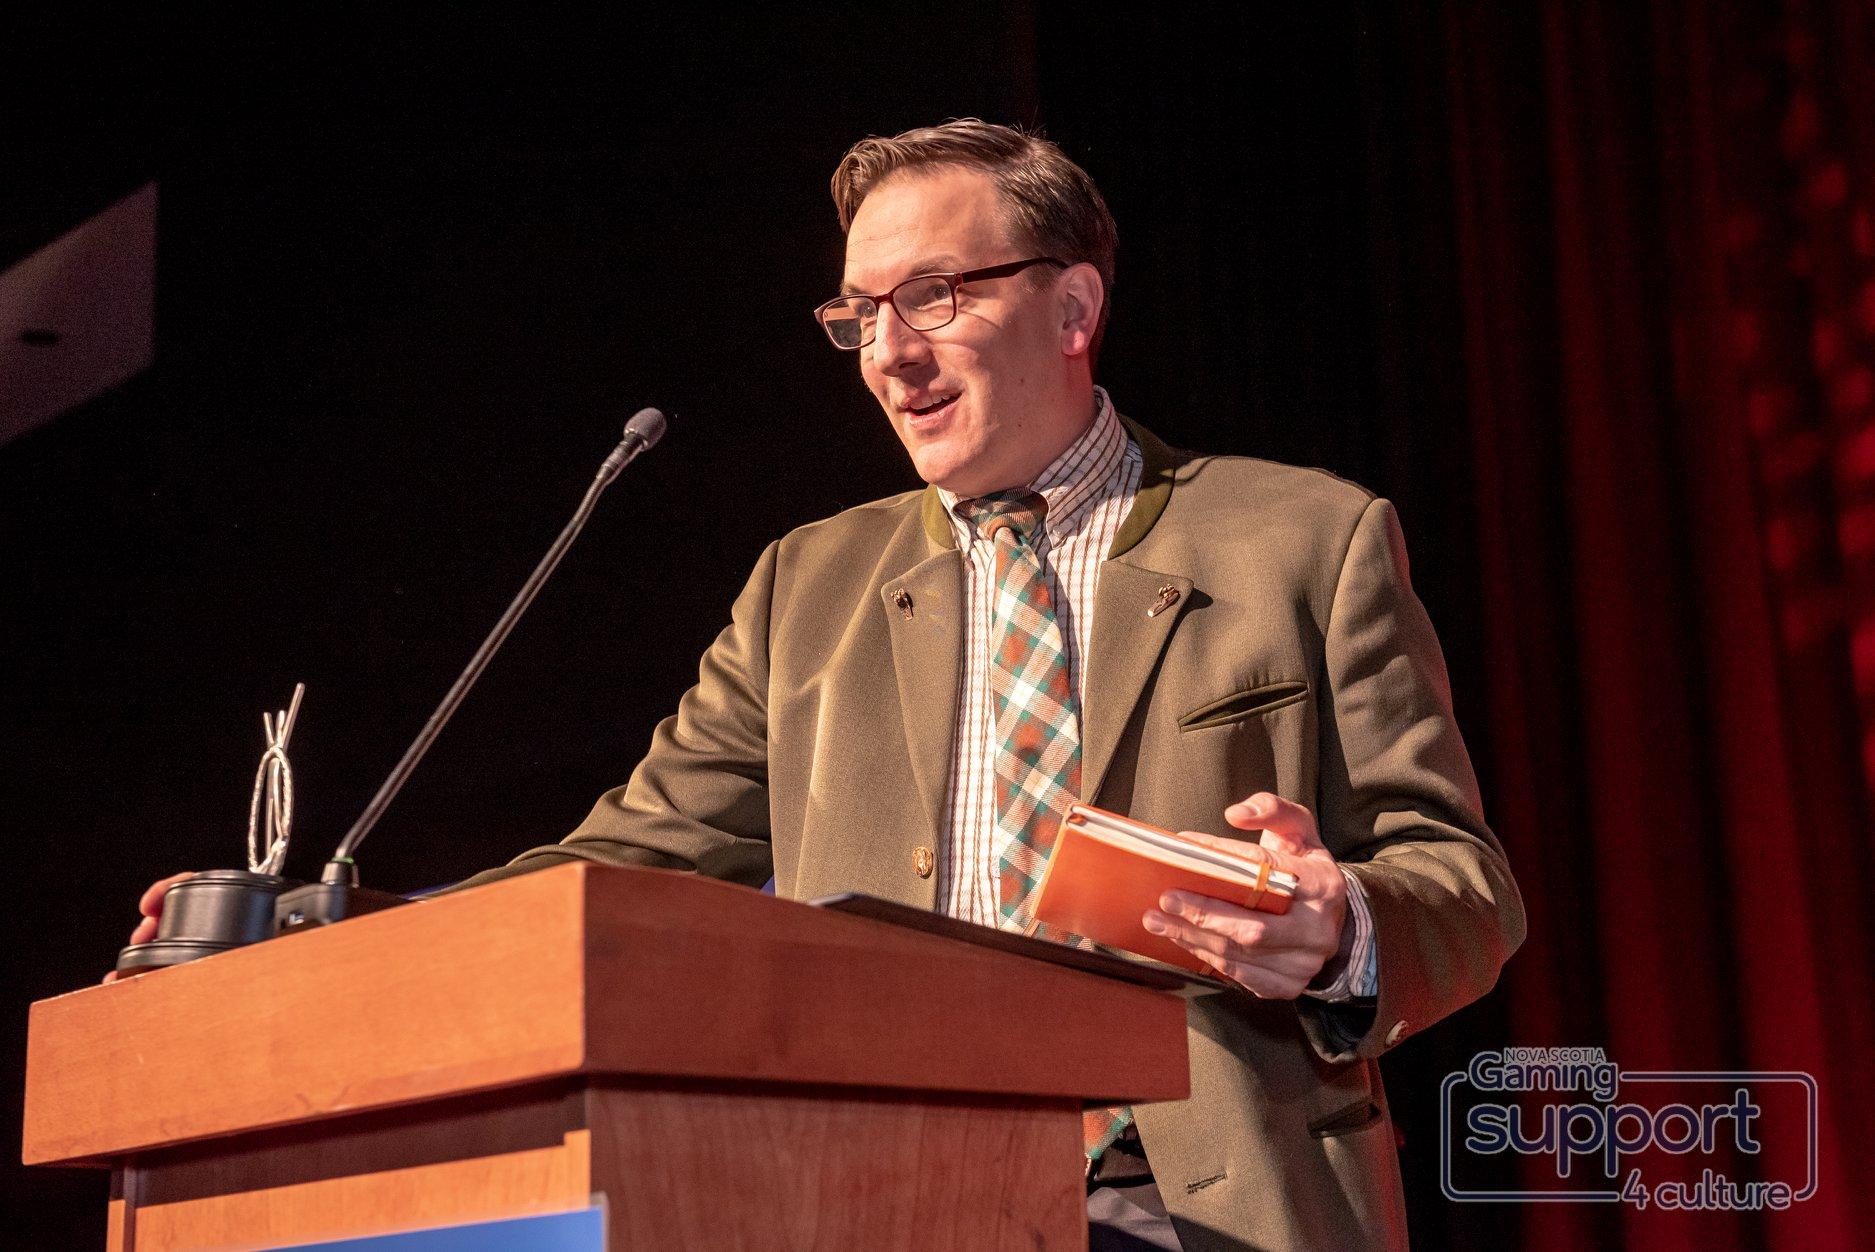 2019 Outstanding Technician Award Winner: Andrew Cull